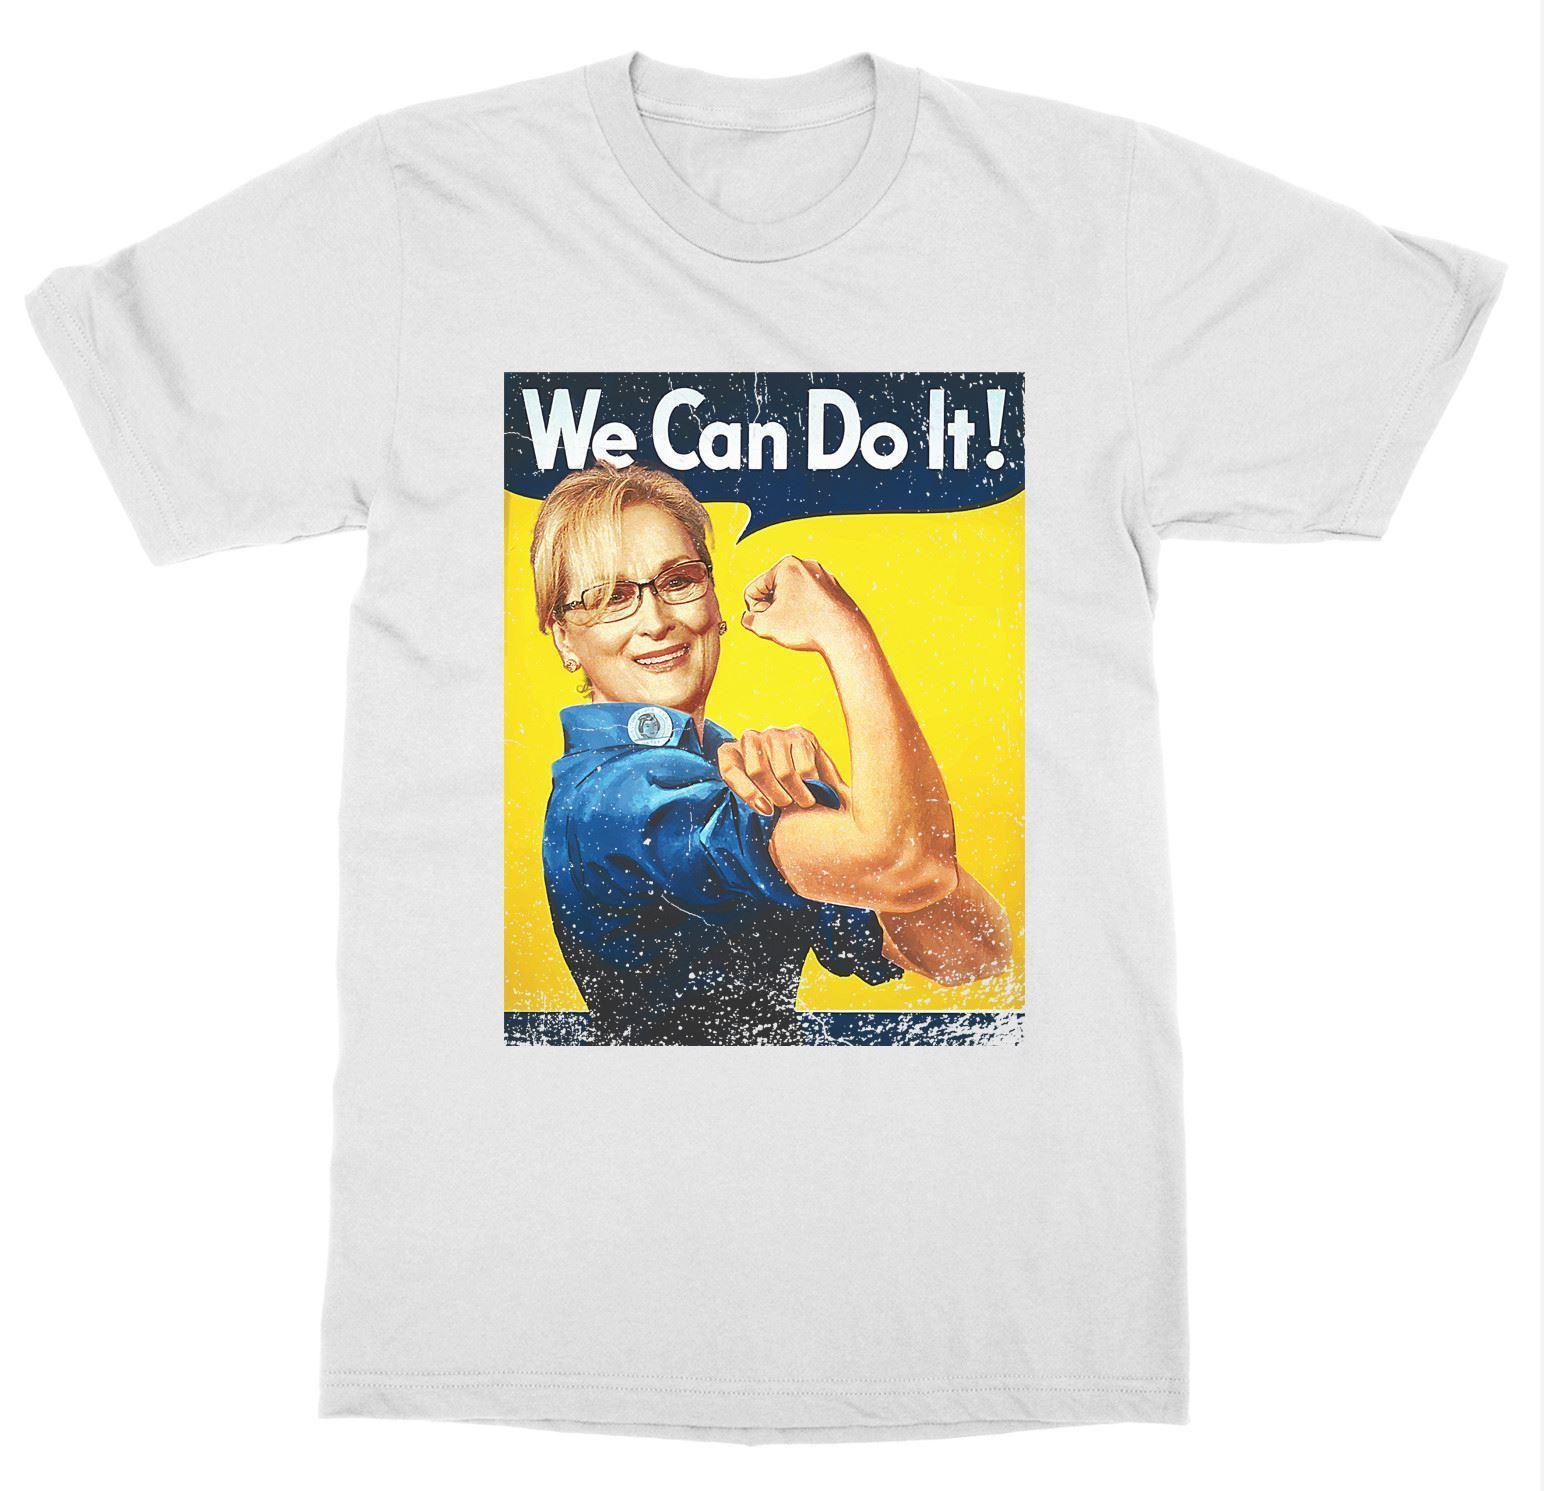 b88910a9c Short Sleeve for Men Clothing Summer Meryl Can Do It T Shirt Streep Feminist  Rosie The Riveter Girl Power Tee Shirt-in T-Shirts from Men's Clothing on  ...